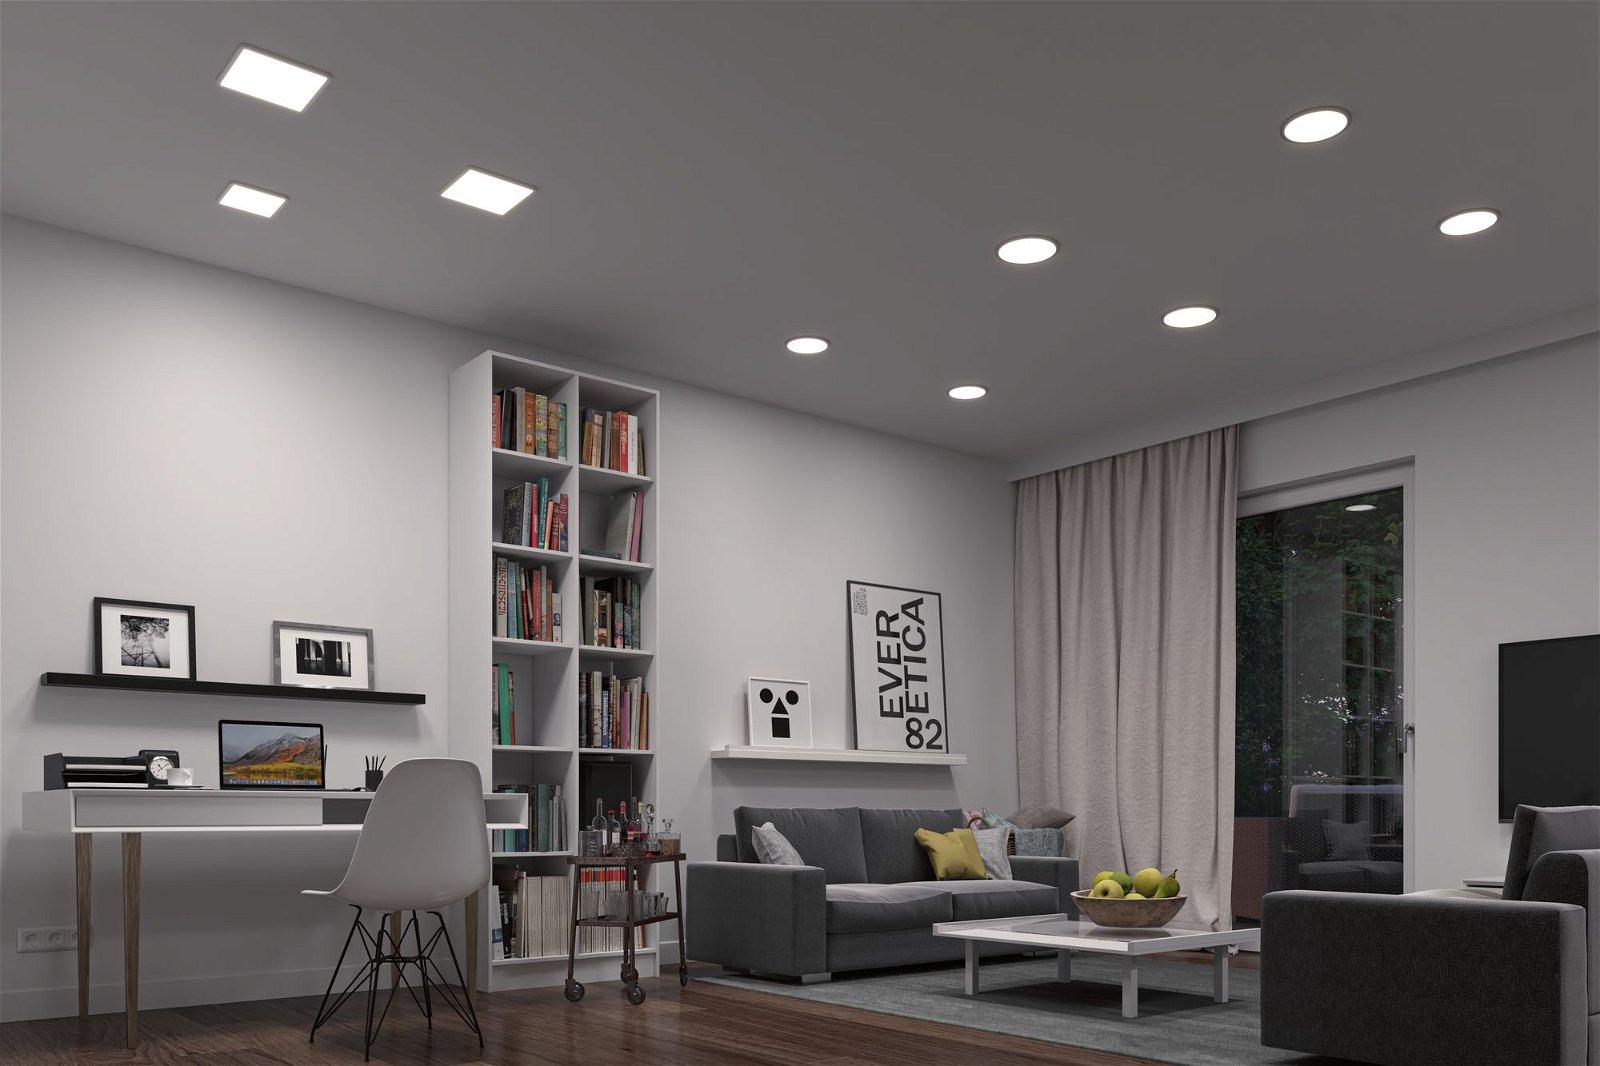 VariFit LED Einbaupanel Smart Home Zigbee Areo IP44 eckig 175x175mm 1800lm Tunable White Weiß